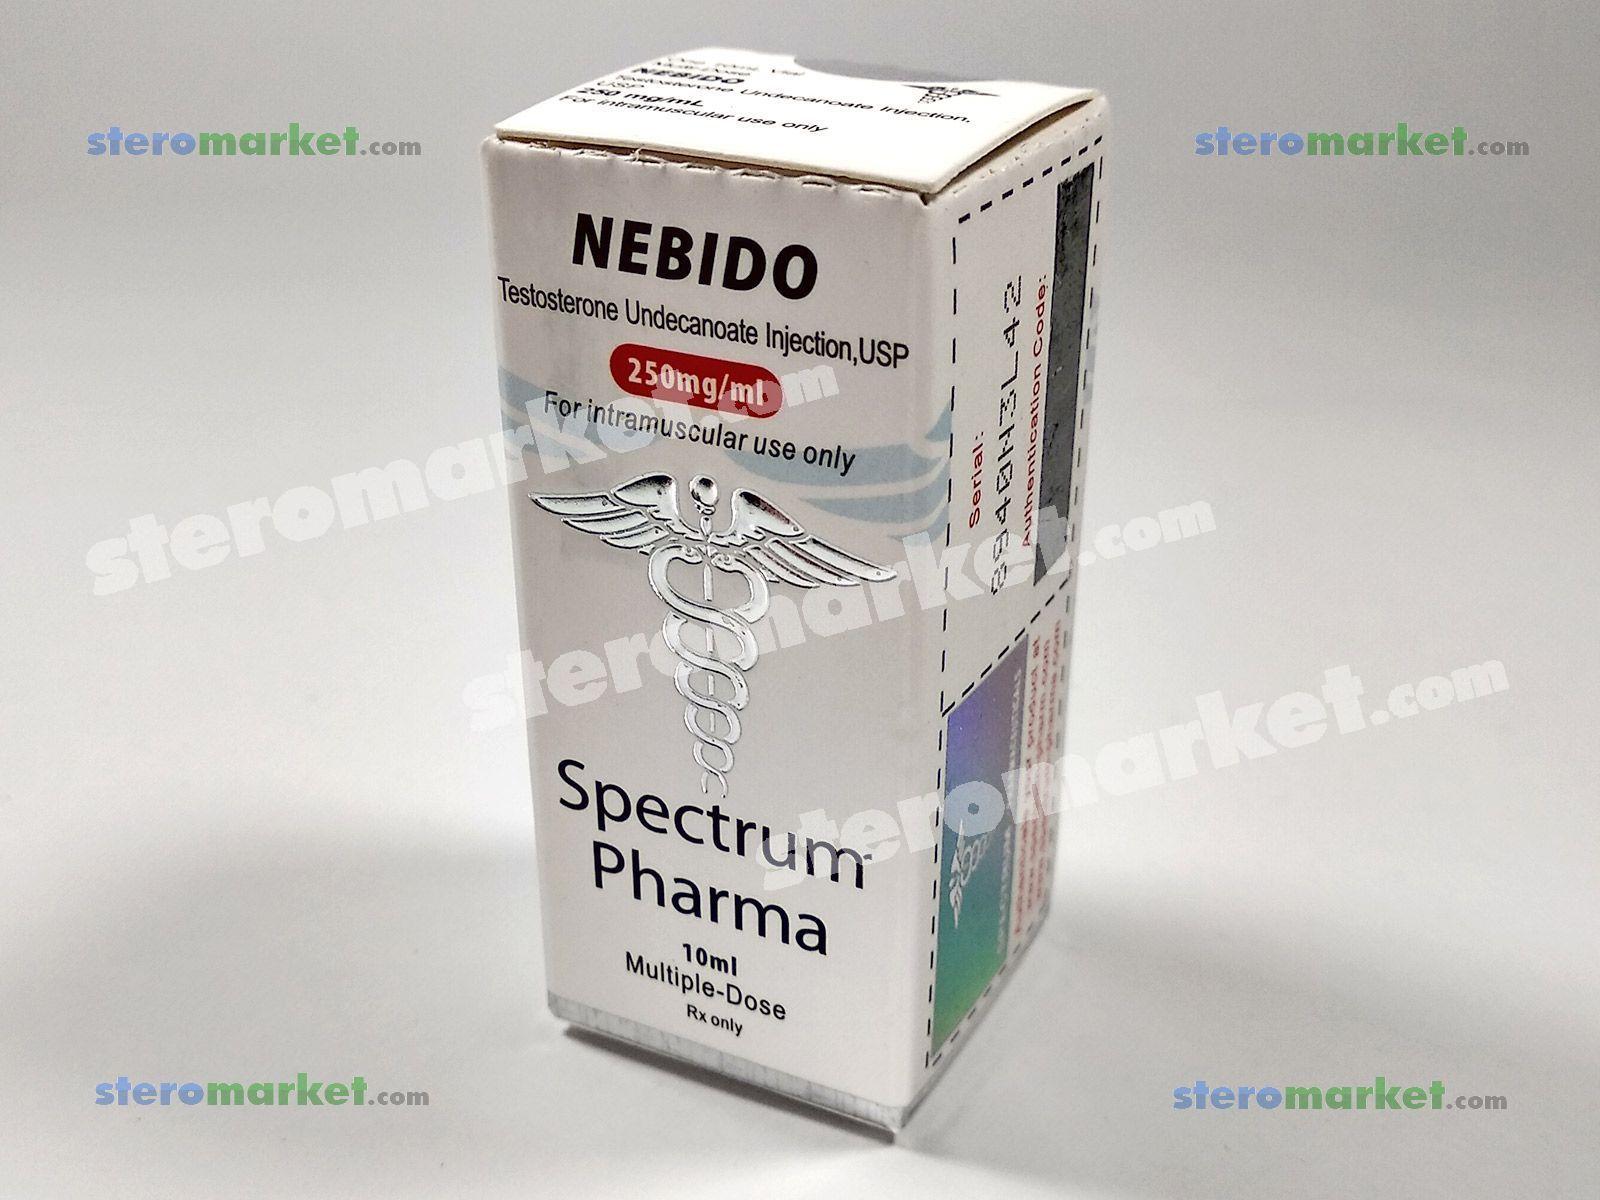 Spectrum Nebido 250mg 10ml vial Buy Online • USA • for SALE